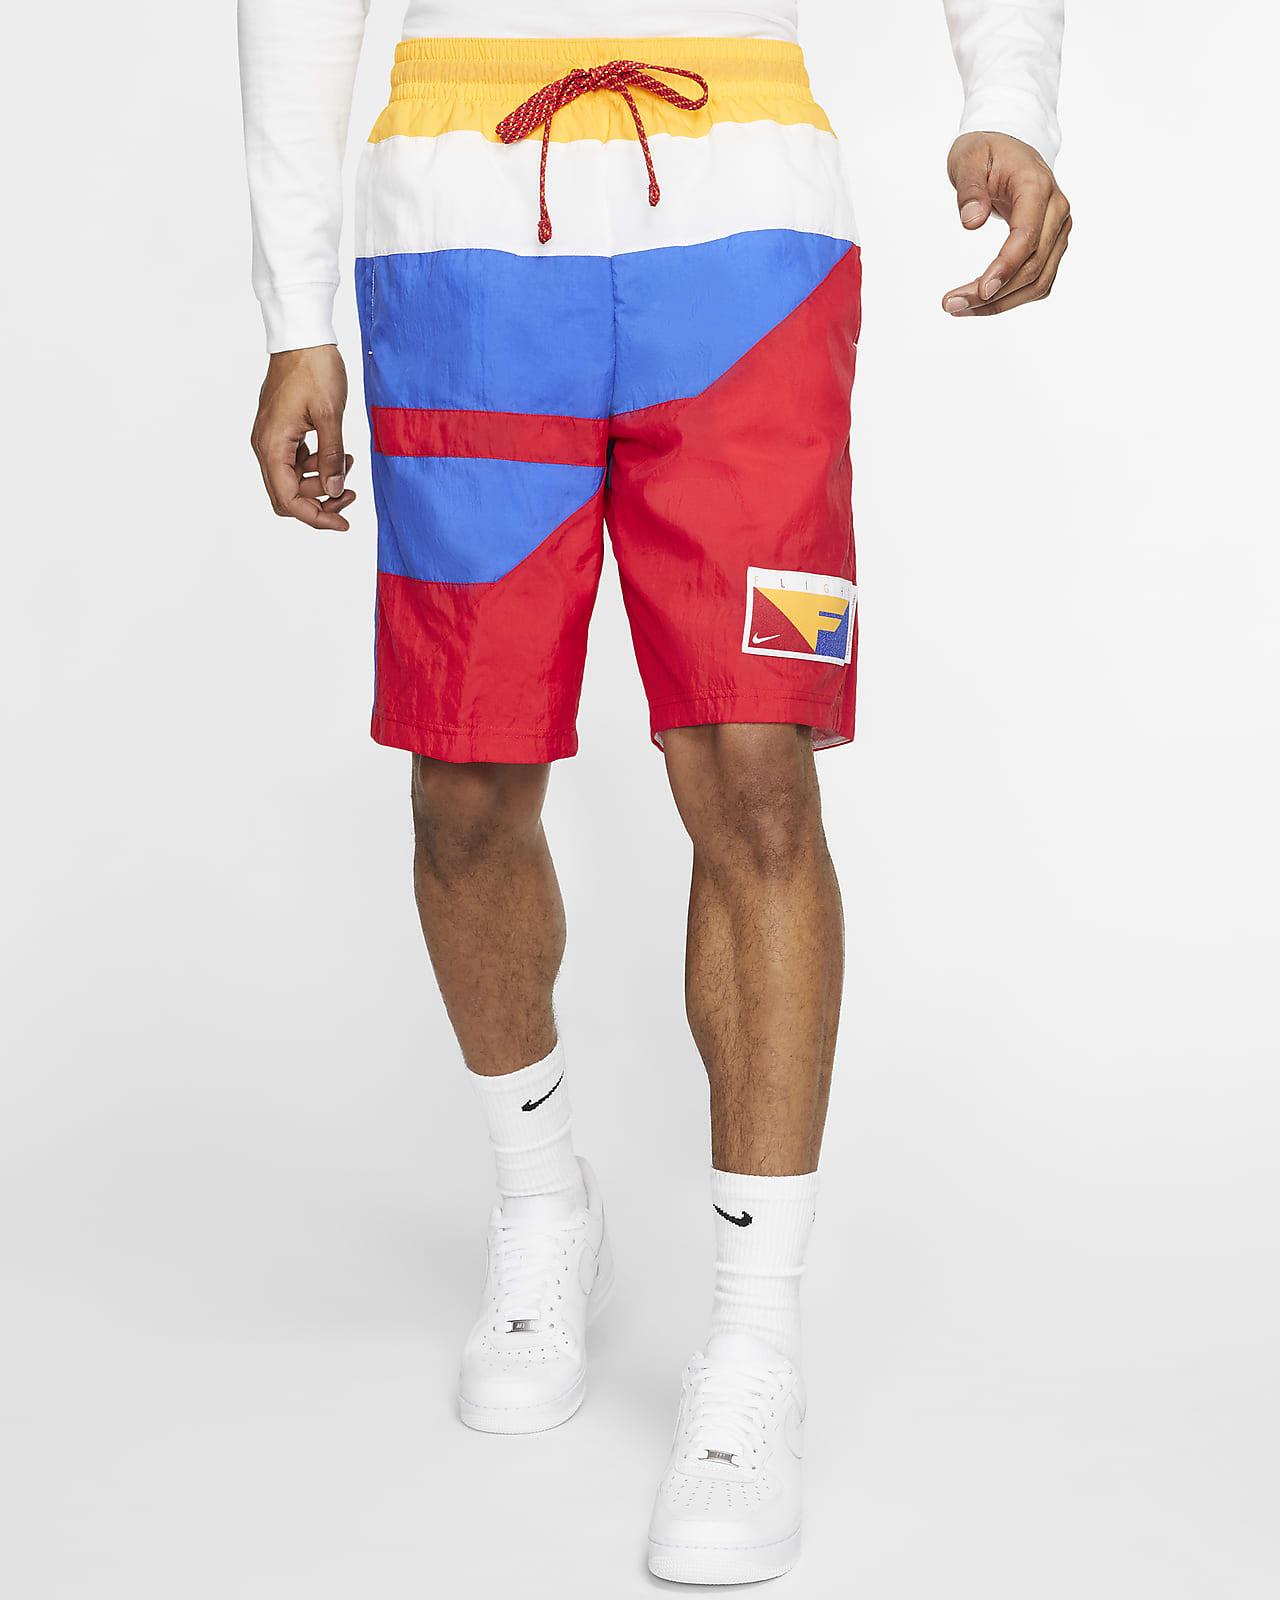 Nike Flight Basketball Shorts